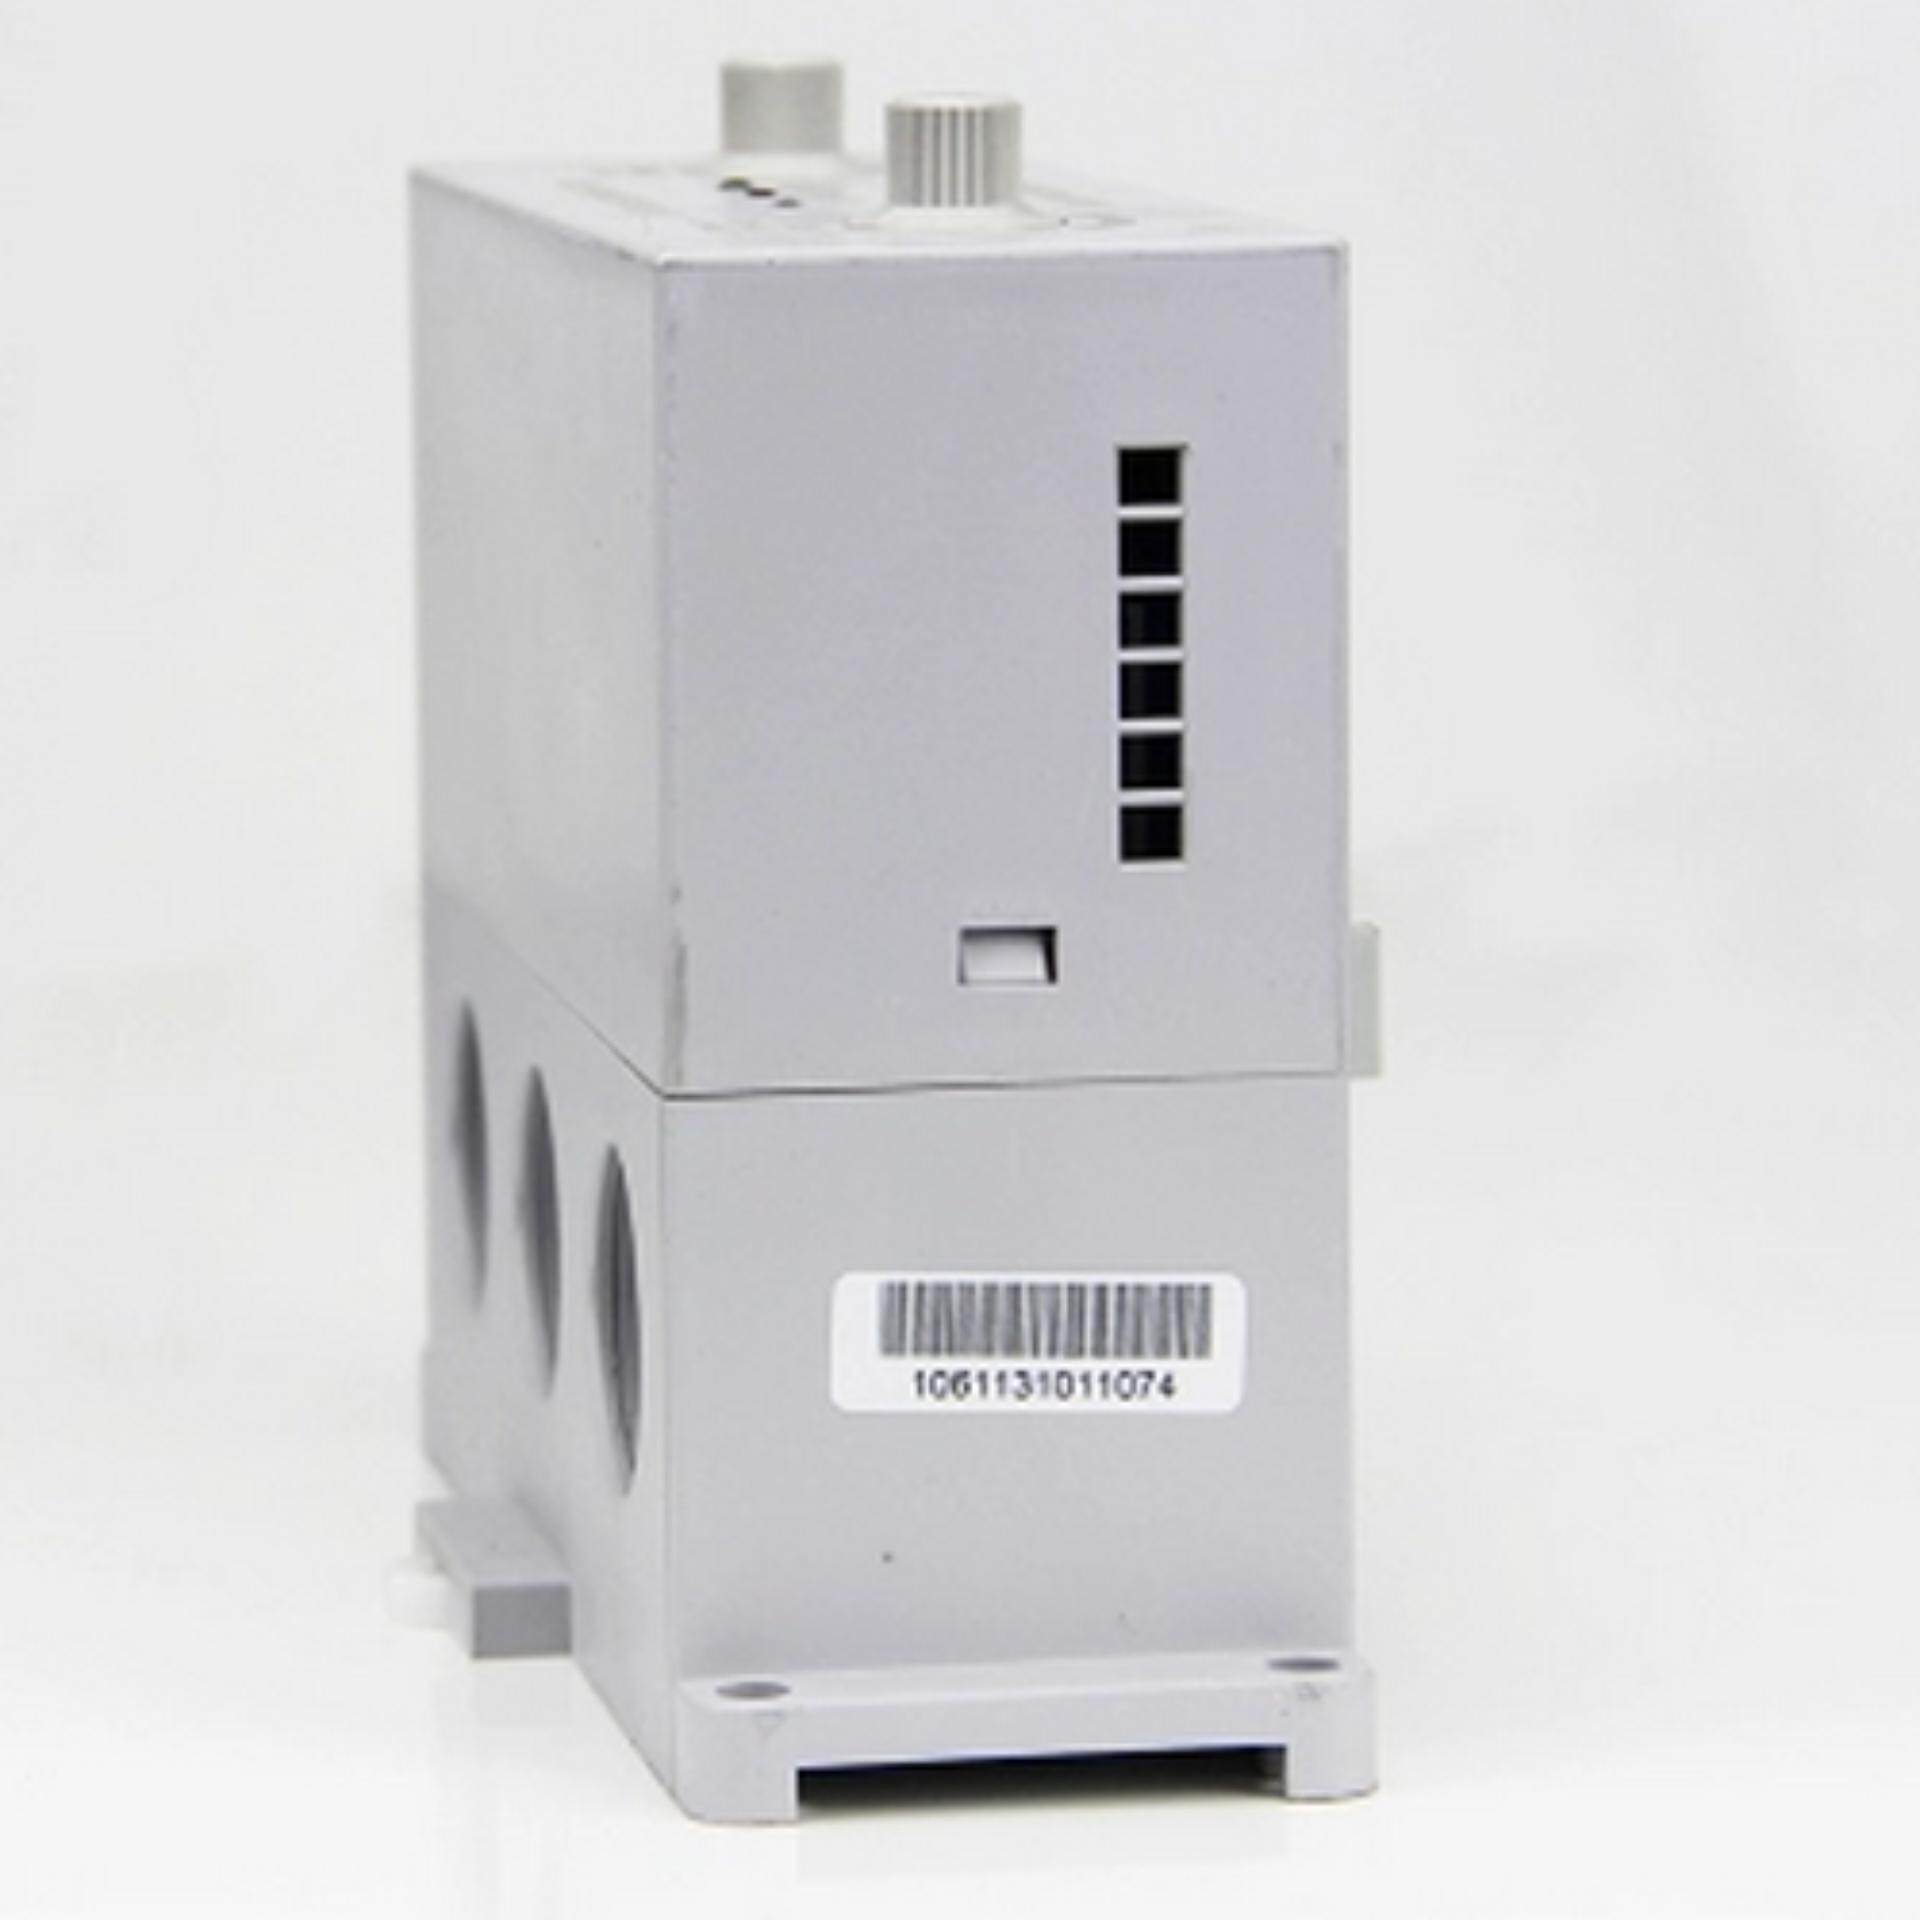 JD-6 63-150A AC220V Motor Pelindung Terpadu Perangkat untuk Alarm atau Perlindungan Operasi, Kesalahan Phase, overload Indikator Kesalahan Sirkuit Lampu dan Motor Kesalahan Fase, Overload, Blok Perlindungan Perpindahan Delixi-Internasional